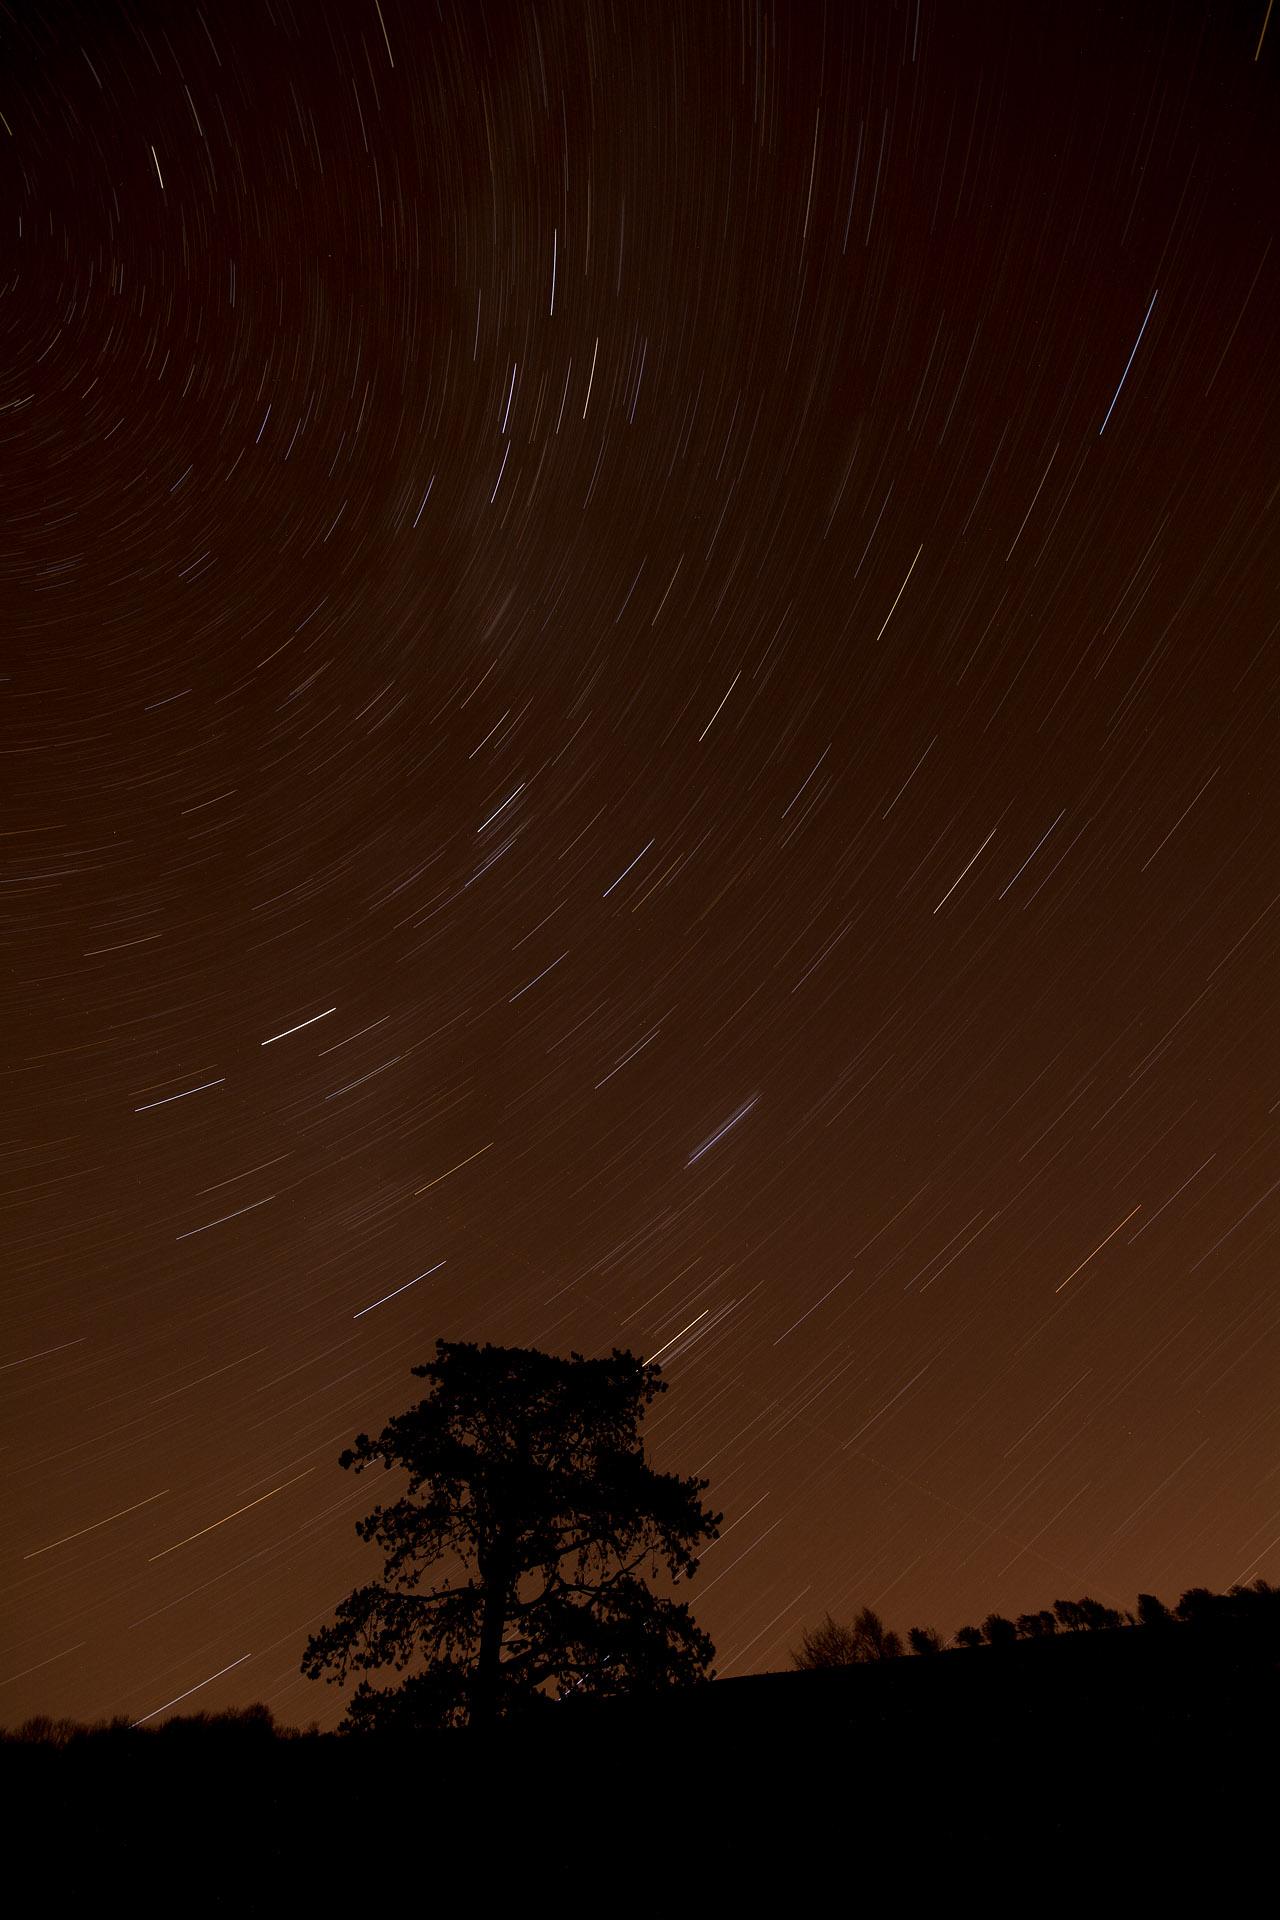 Night sky (30 minute exposure)